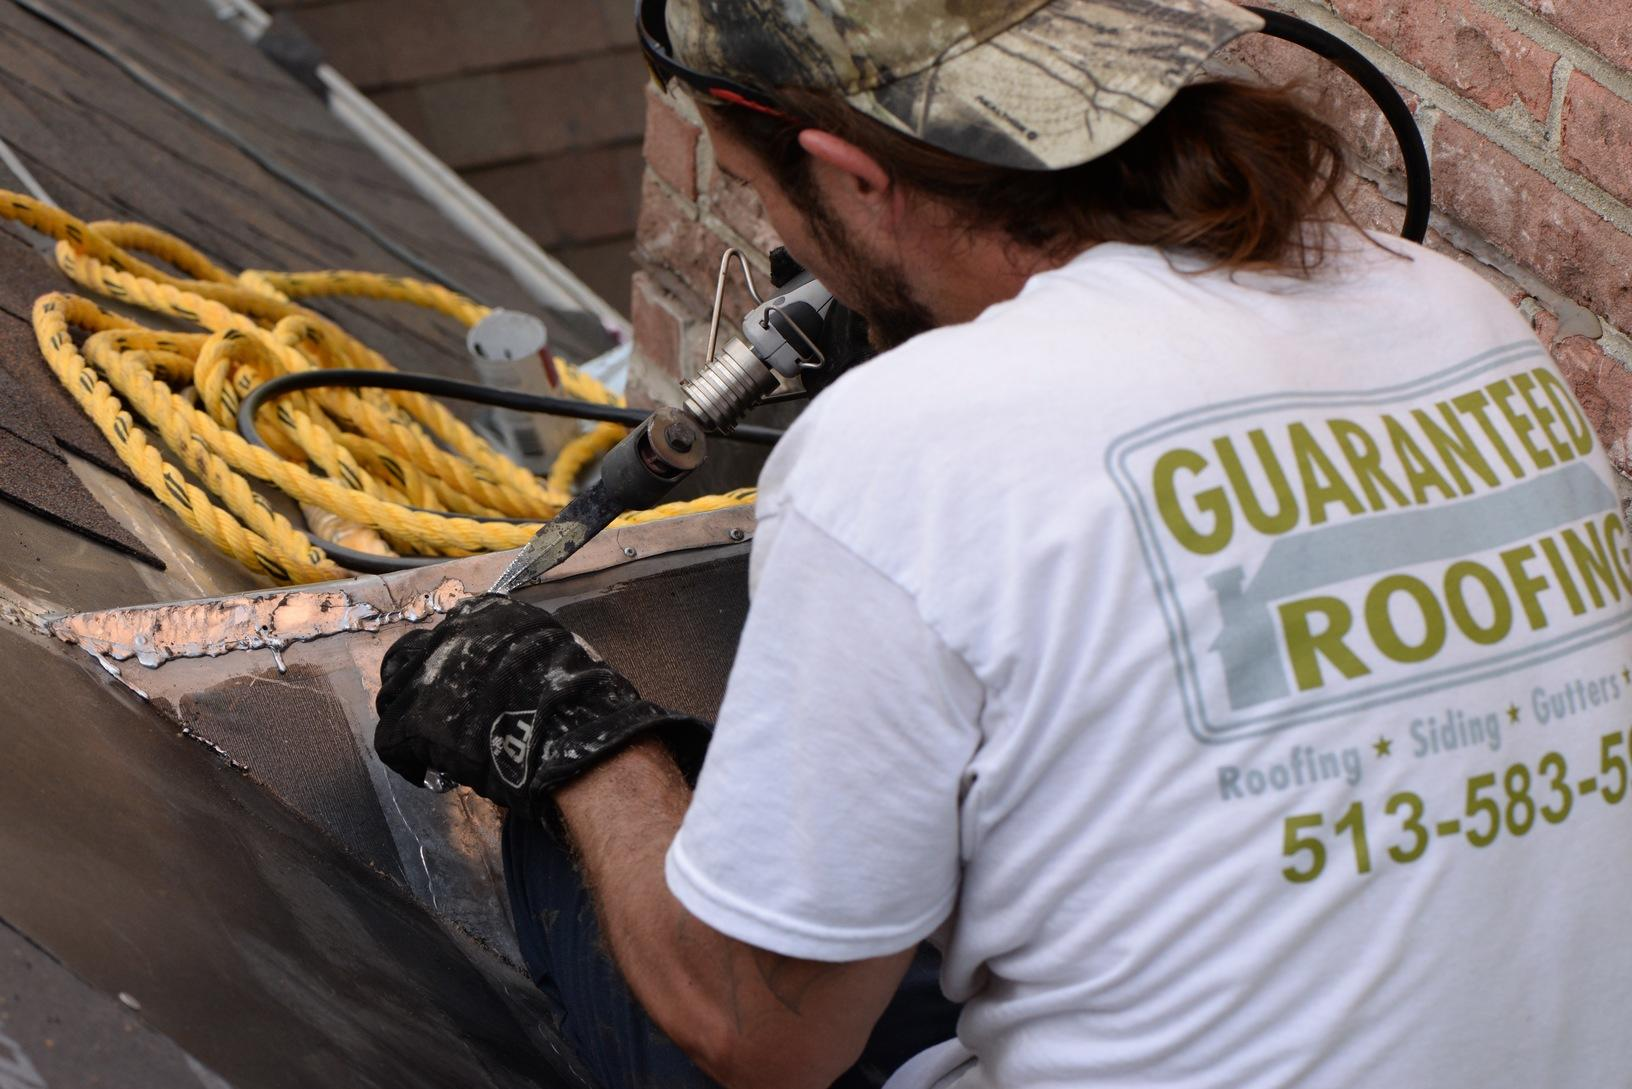 Madeira Guaranteed Roofing Cincinnati Ohio